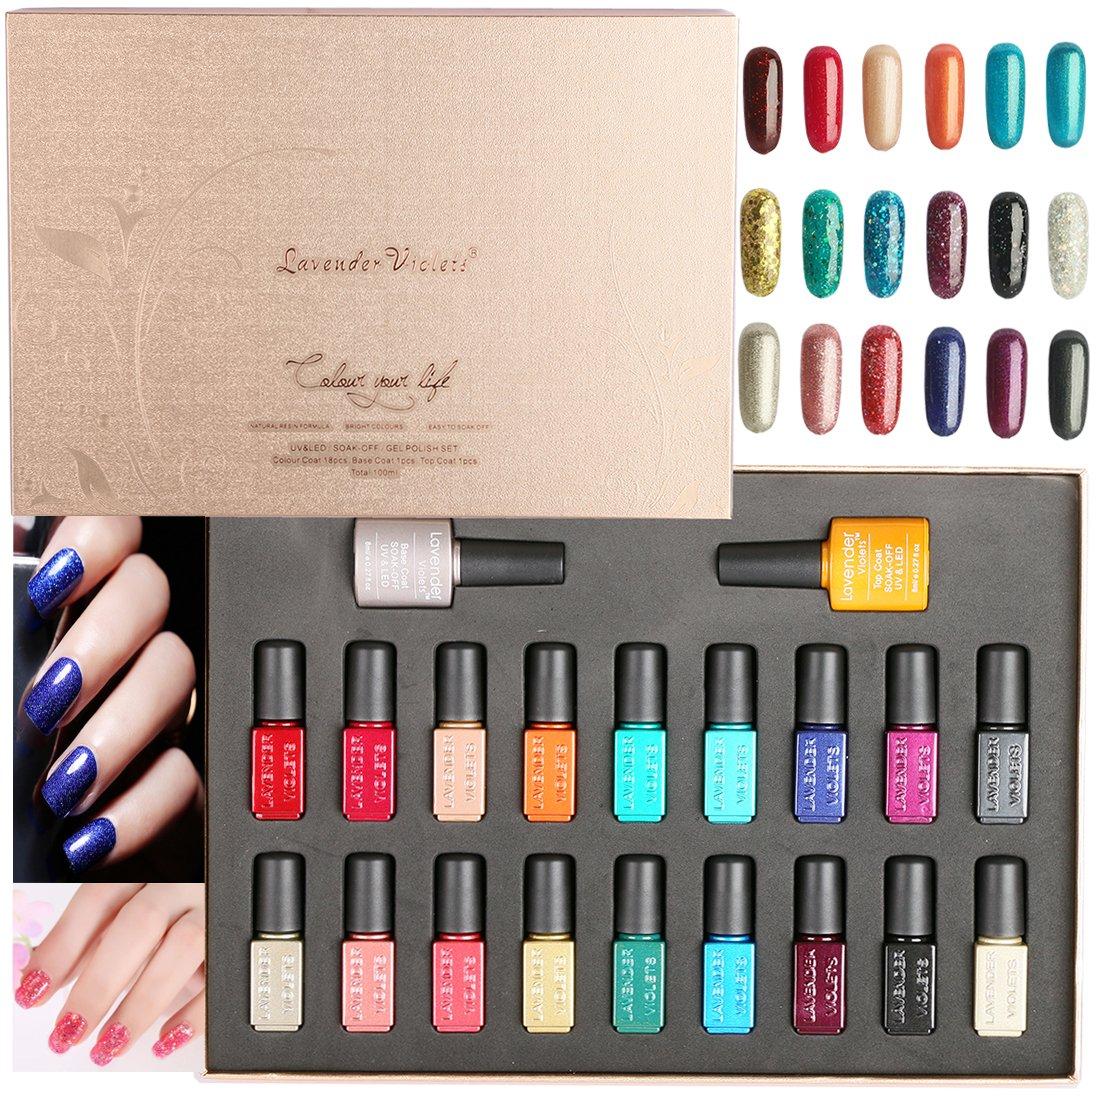 20 PCS Soak Off Glitter Gel Nagellack Lavendel Veilchen UV LED Gel ...